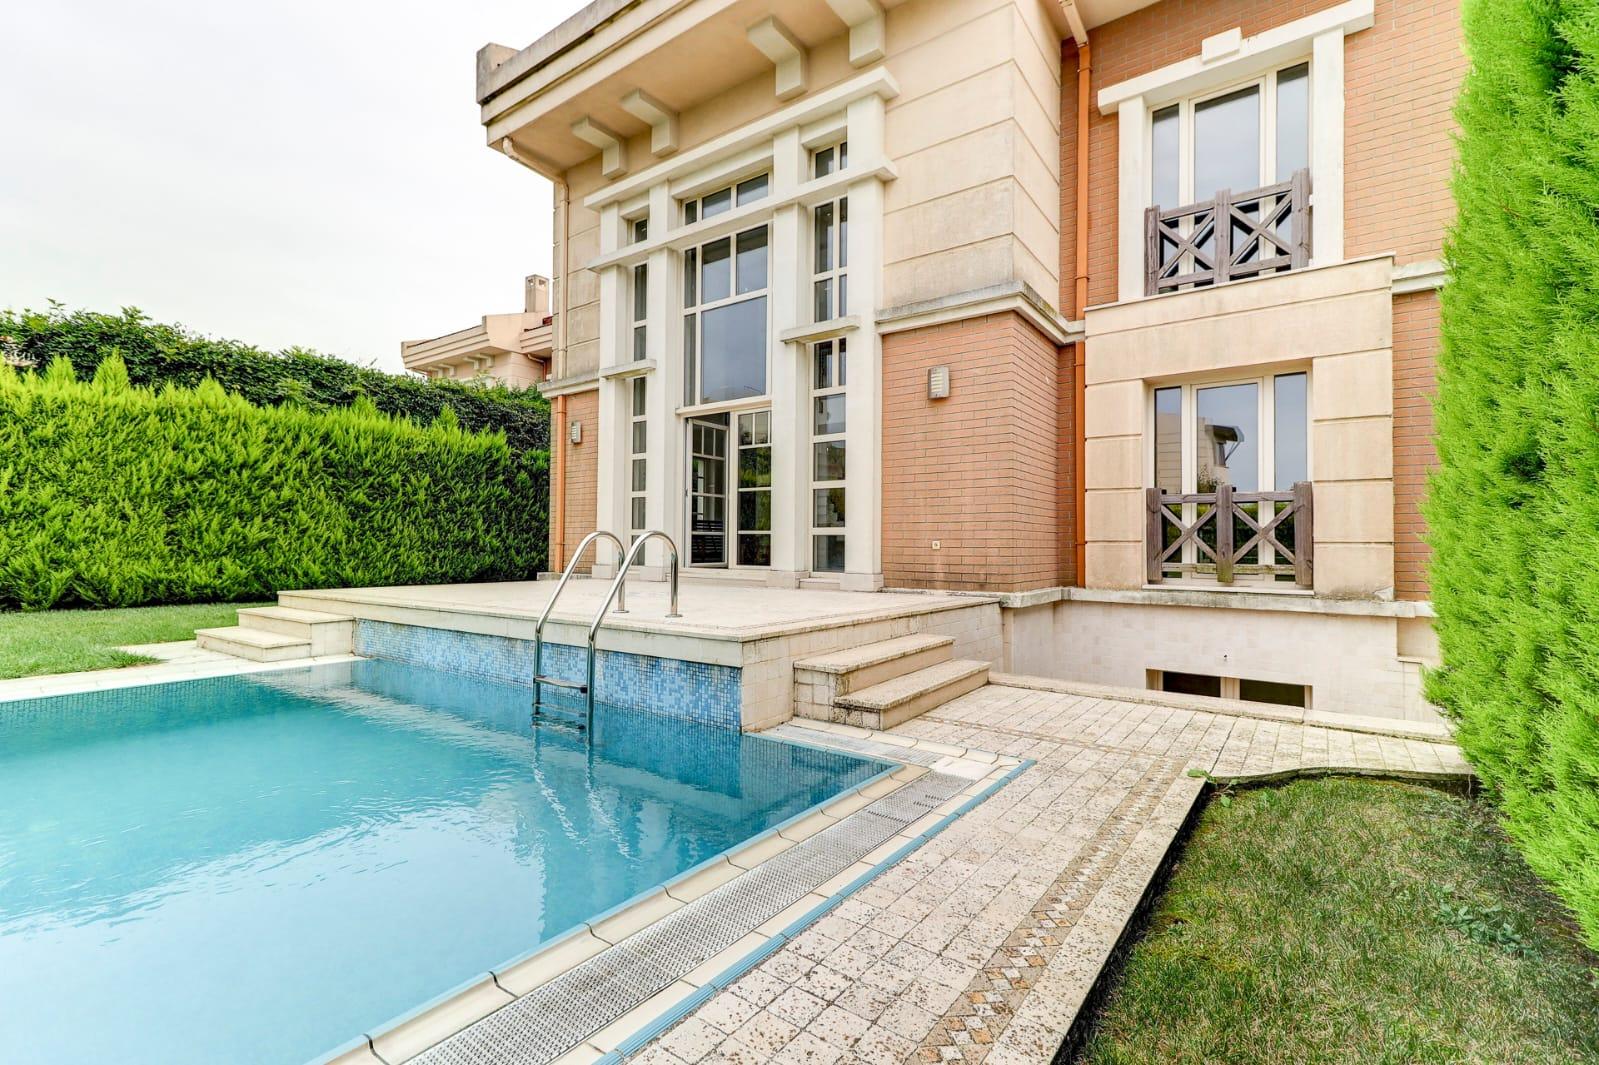 kilyos-villa-istanbul-property014.jpg